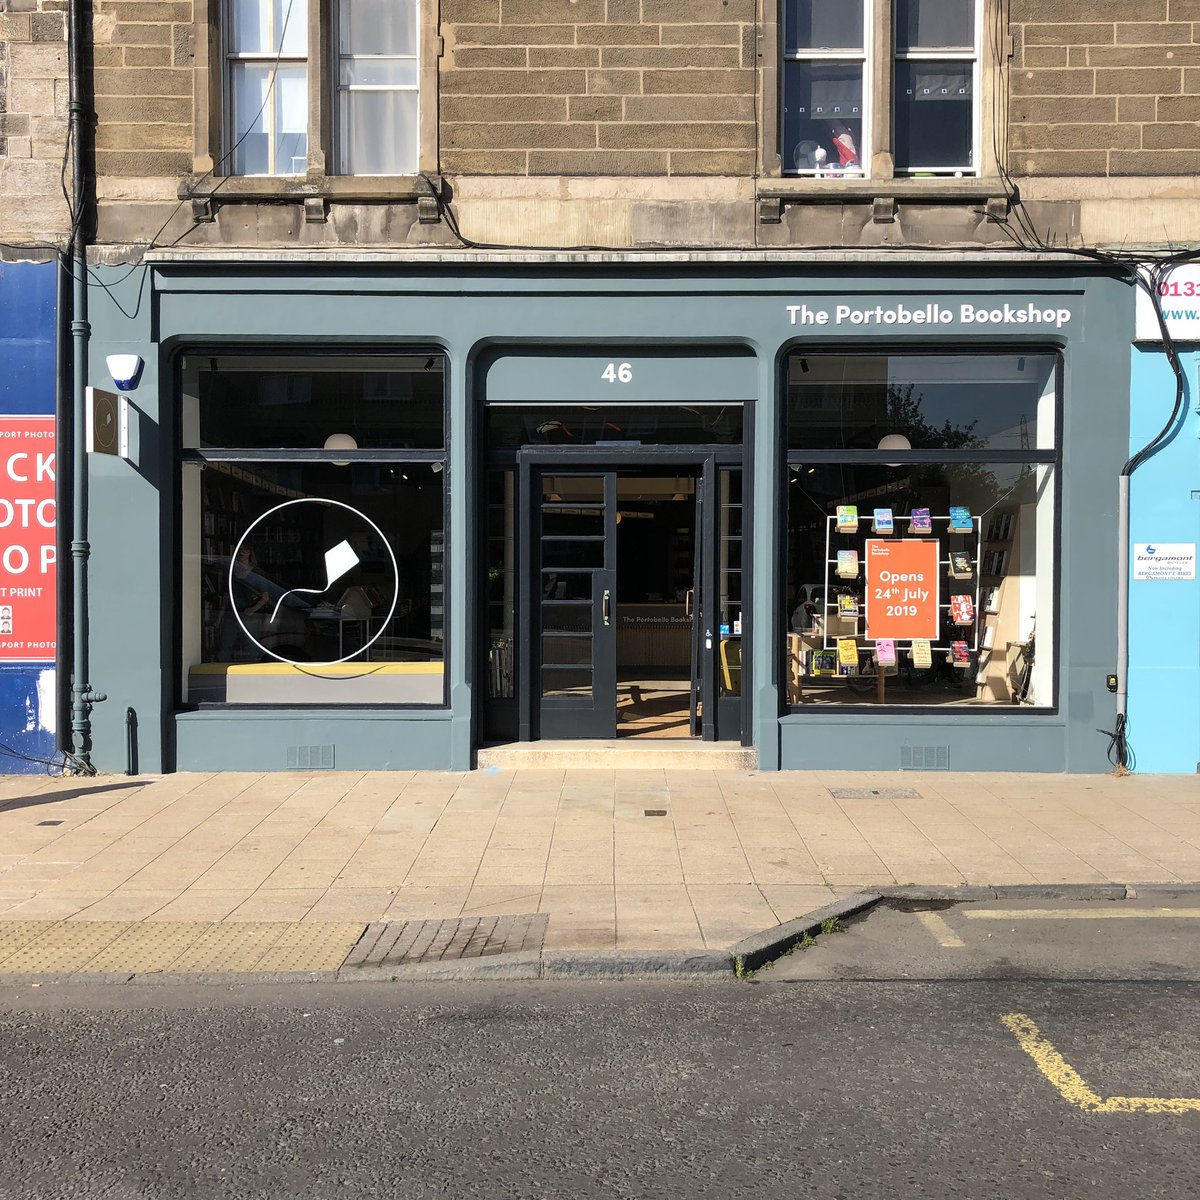 IMAGE_Portobello Bookshop